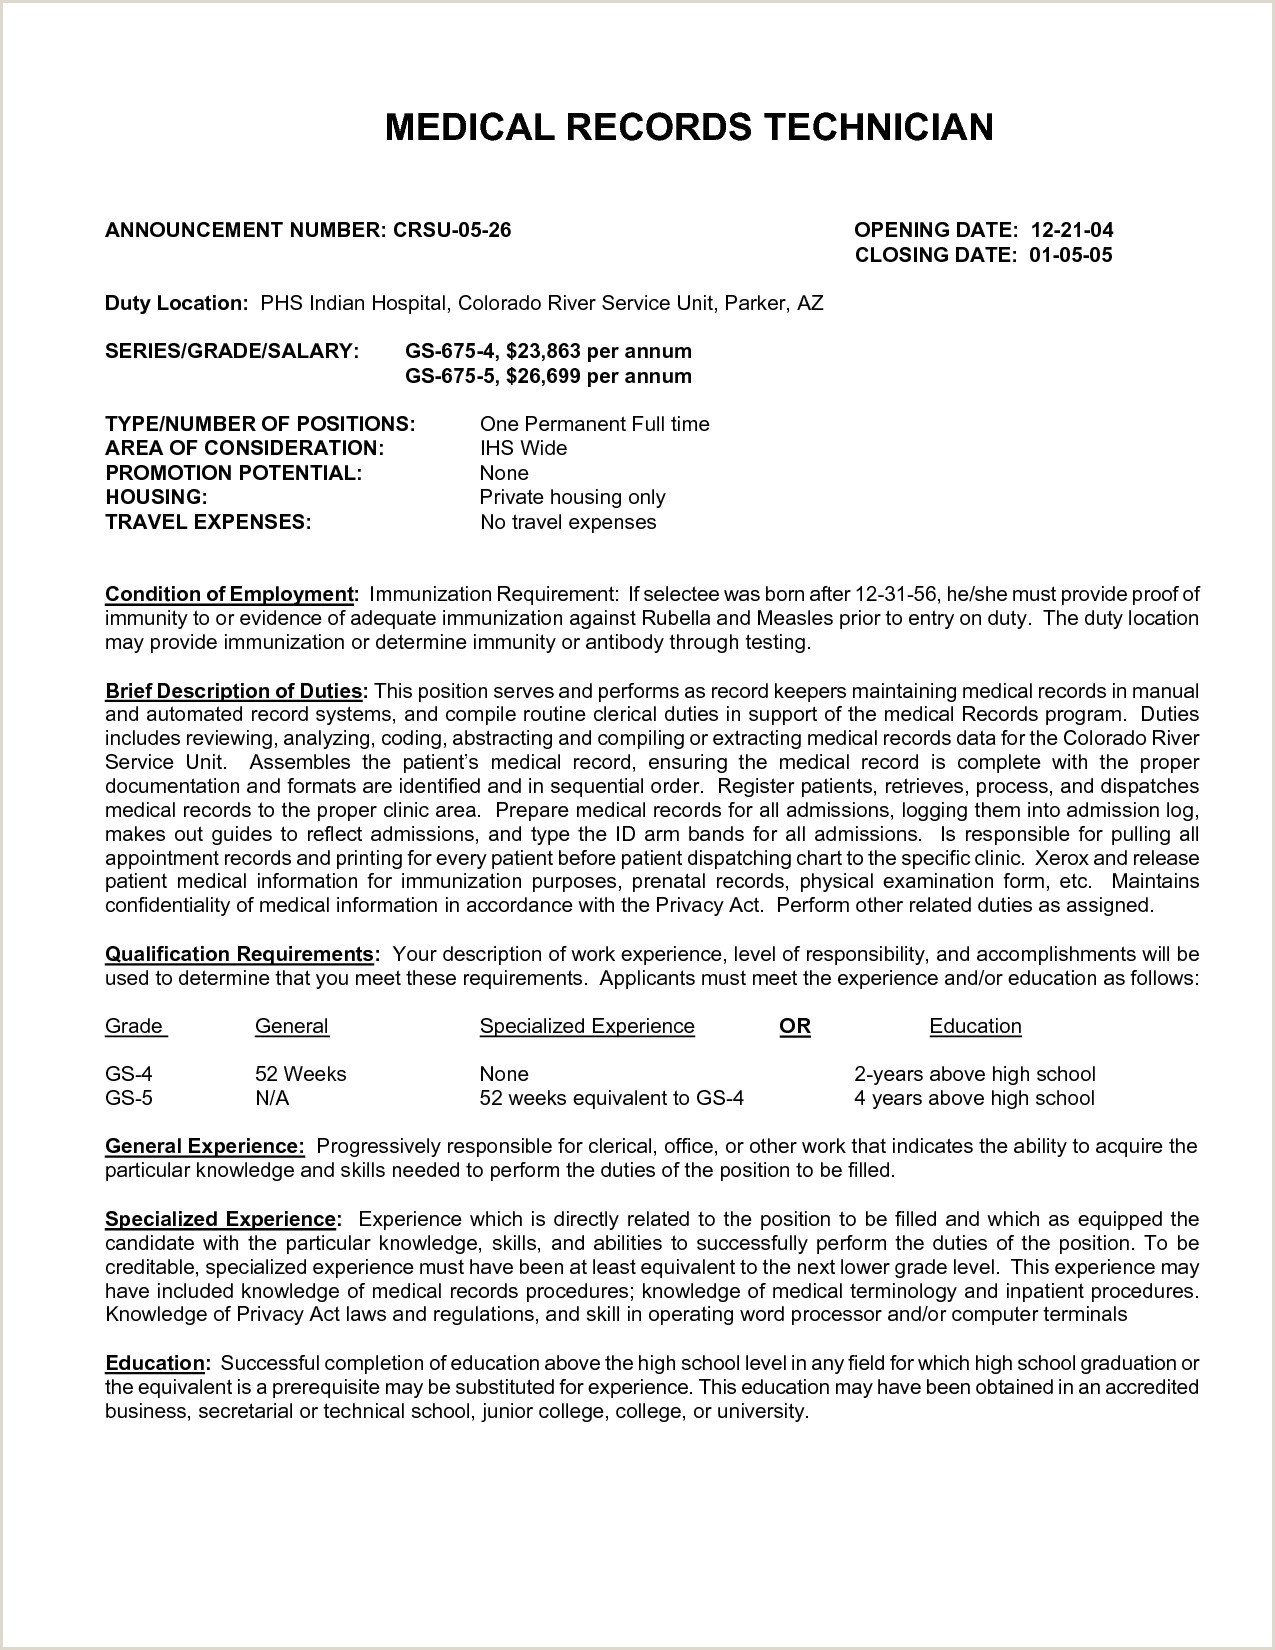 Professional Receptionist Cv Example Uk Free Medical Receptionist Resume Clerks Records Clerk